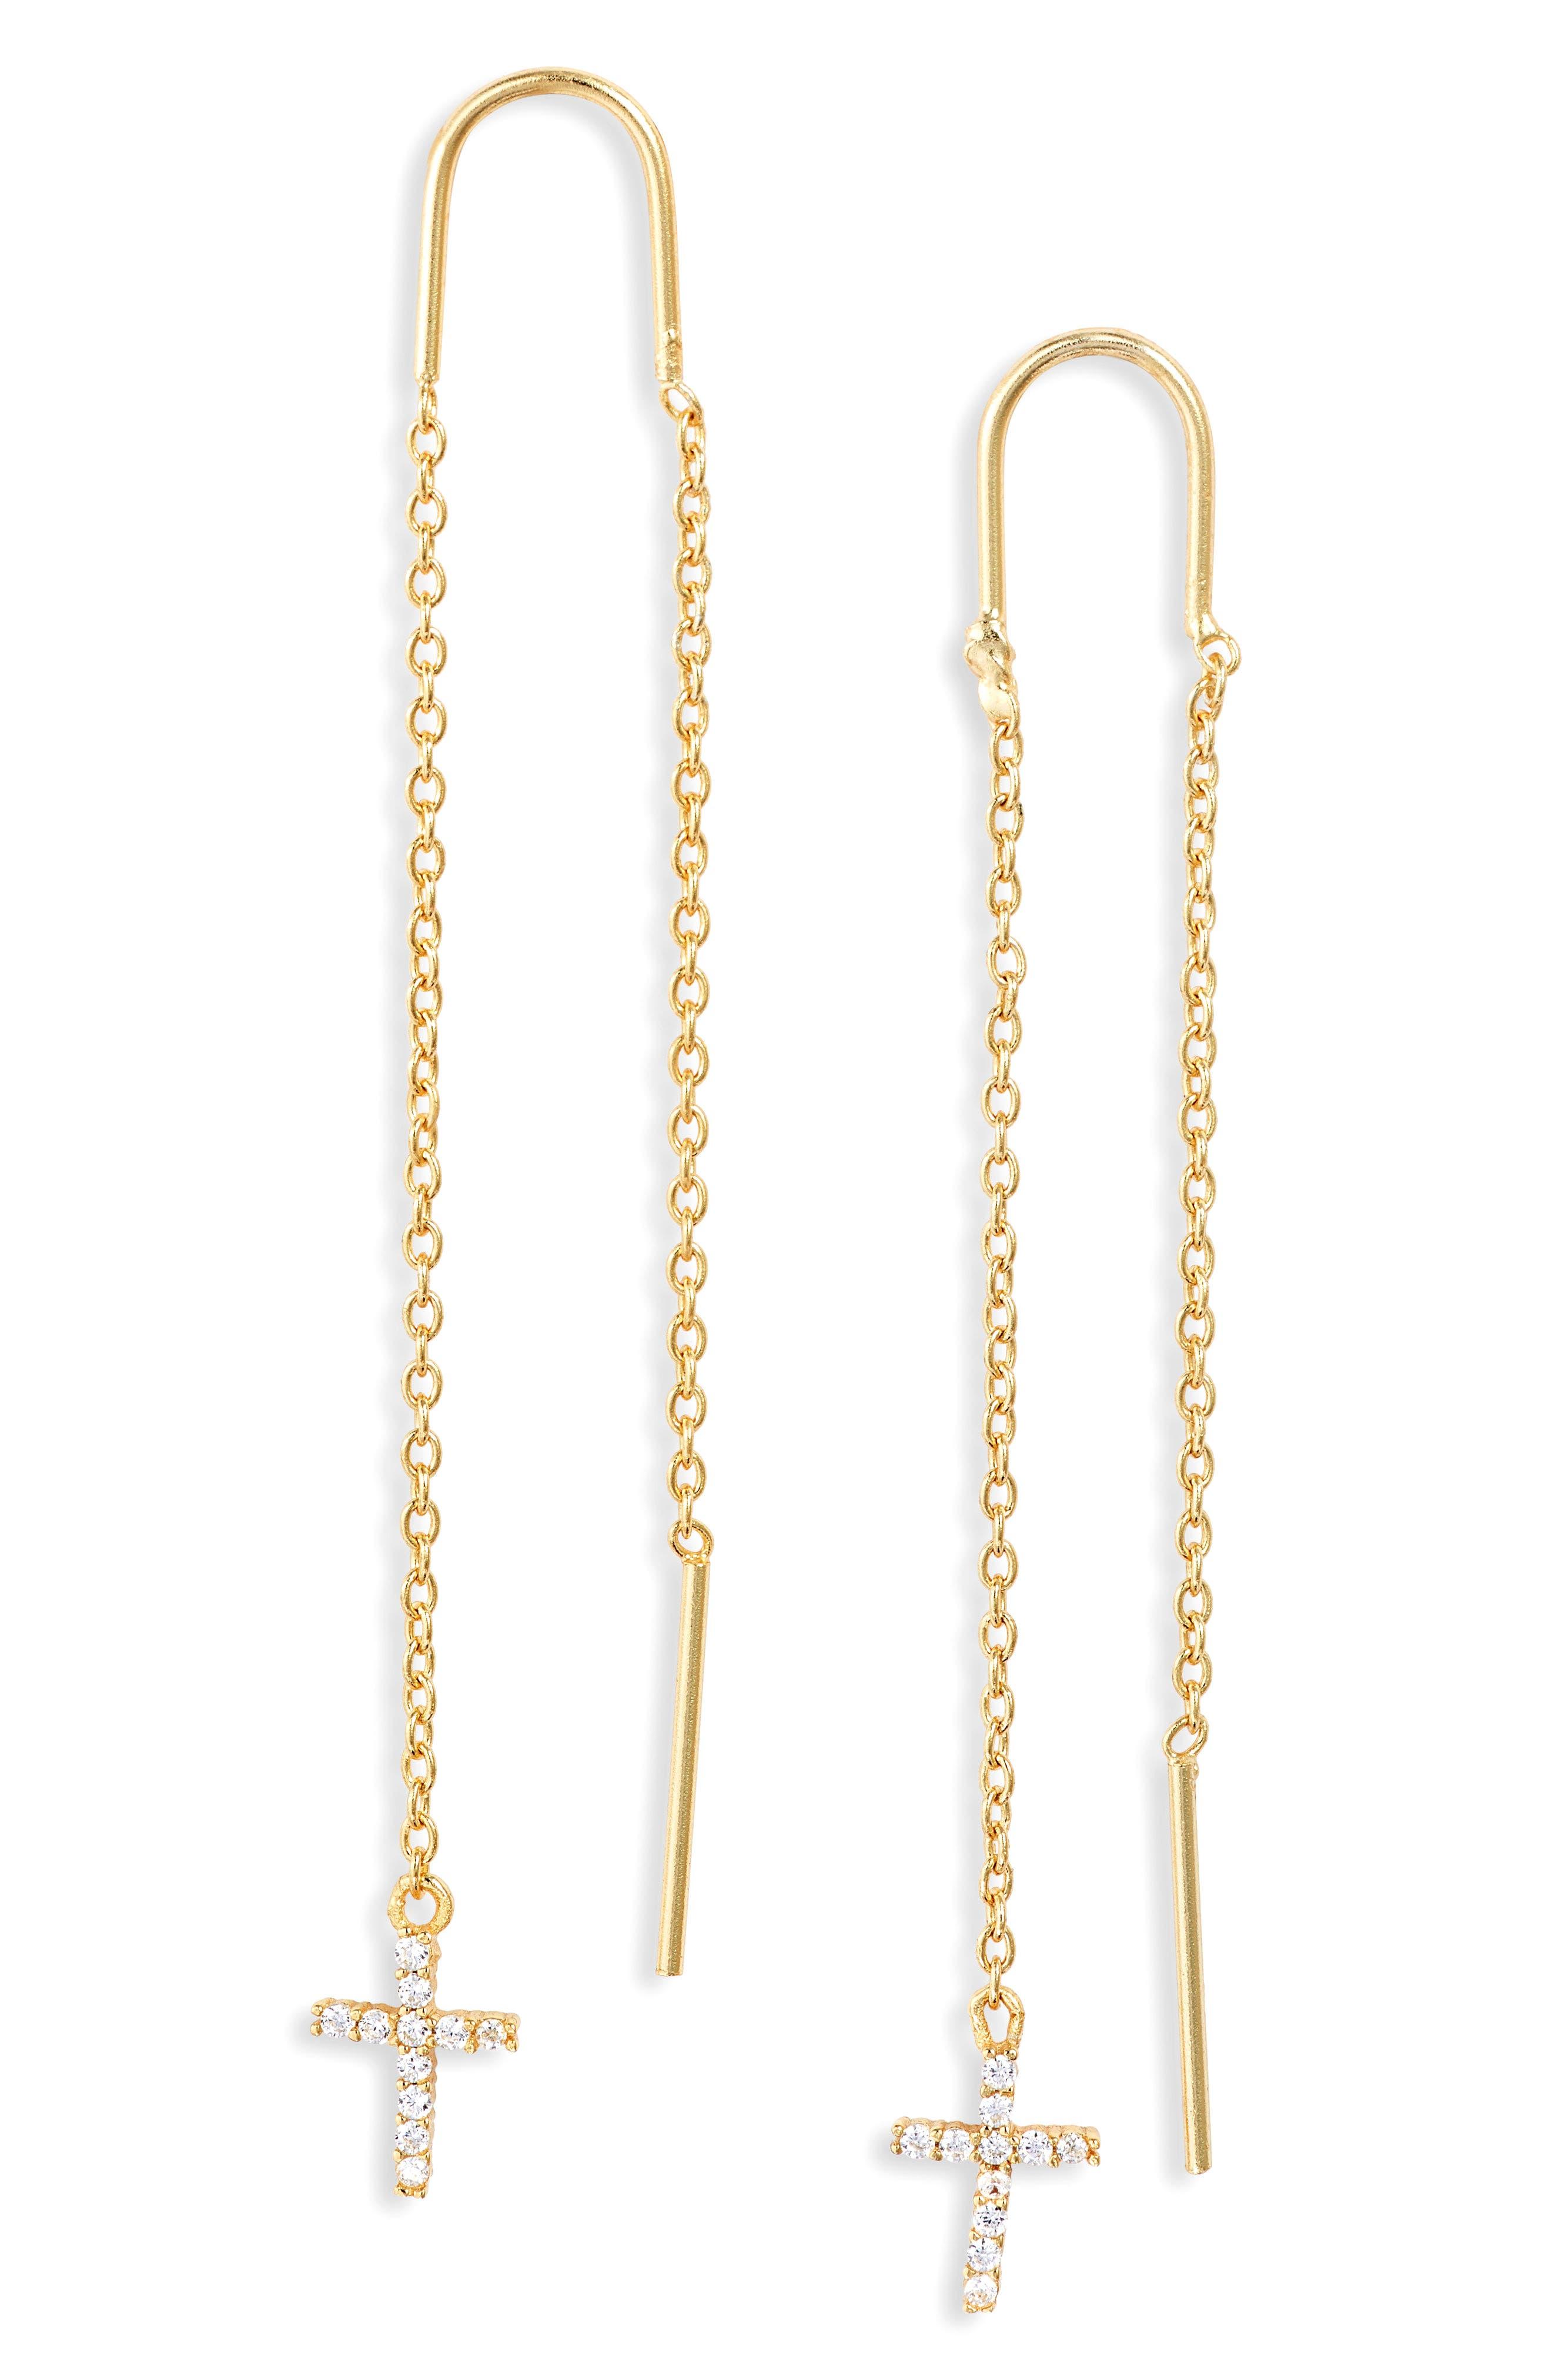 Cubic Zirconia Cross Threader Earrings